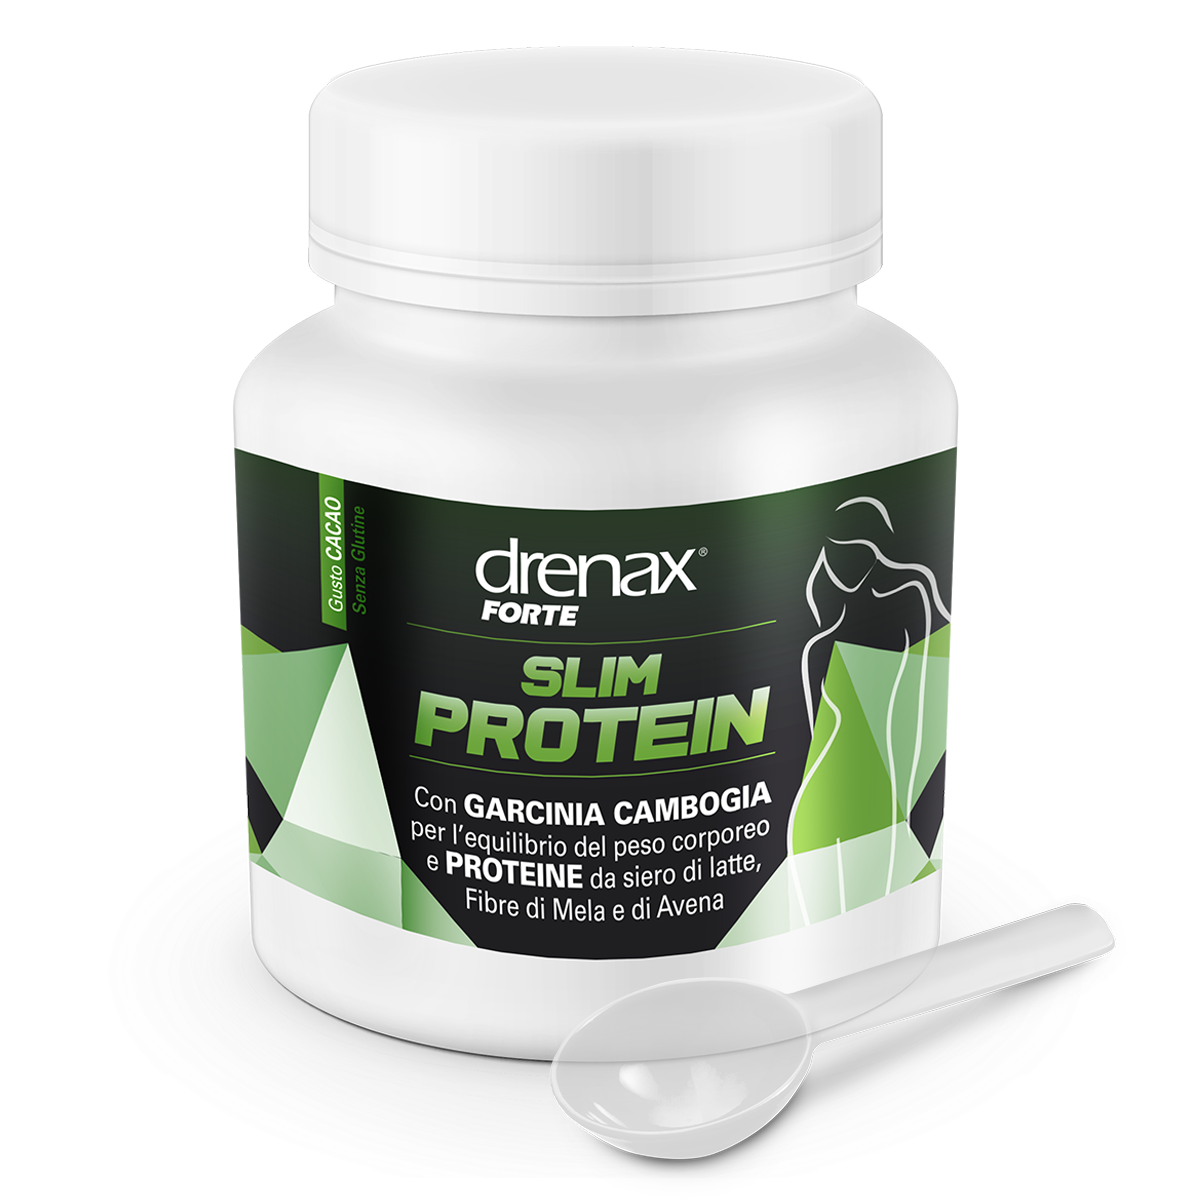 drenax slim protein